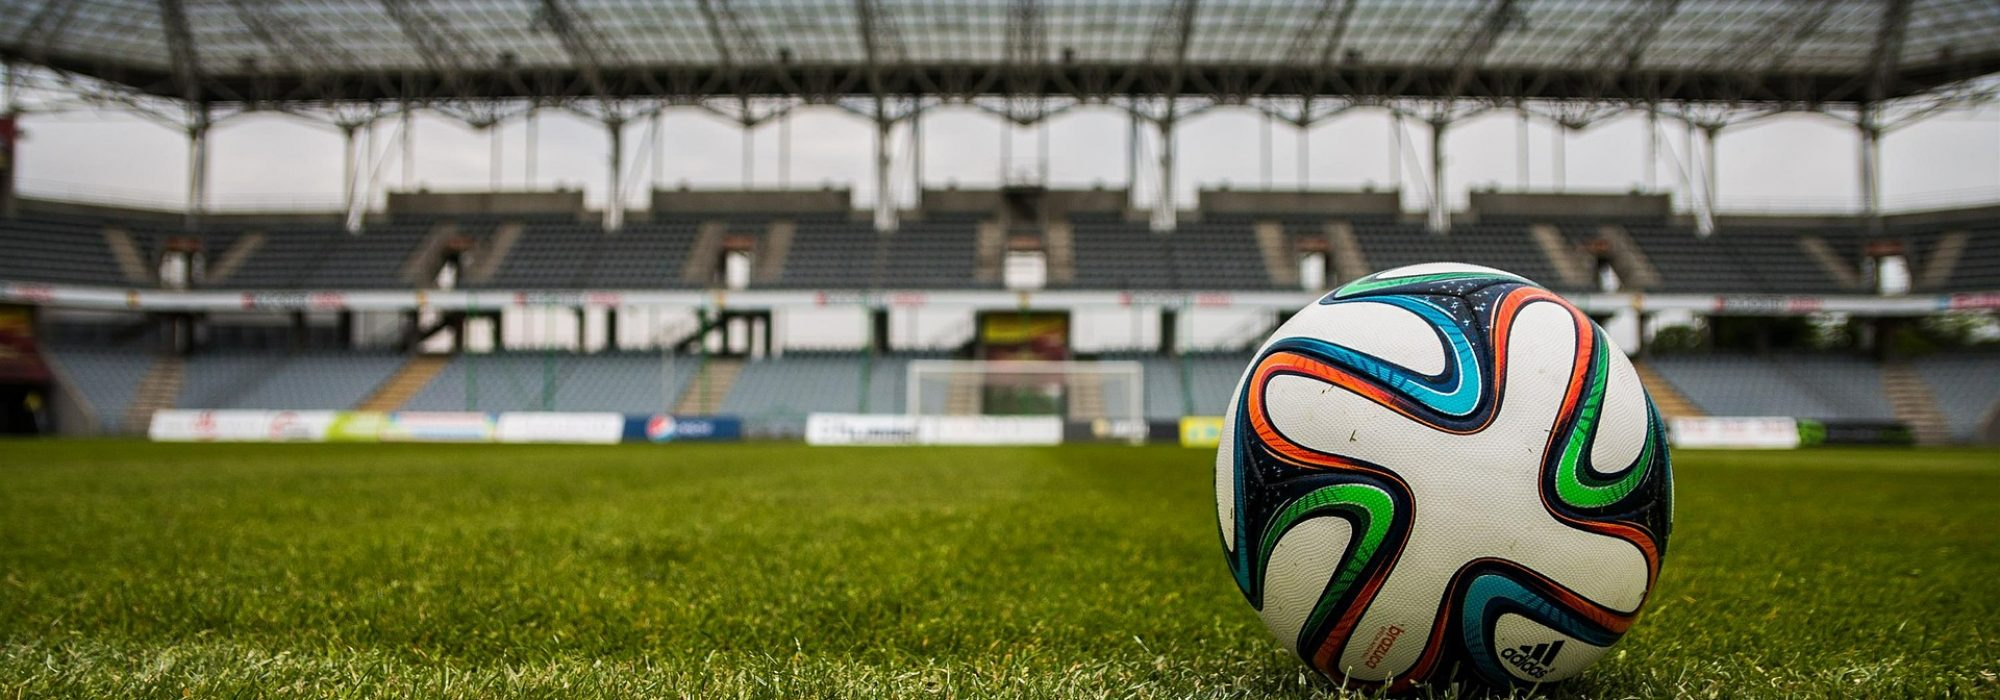 football-488714_1920